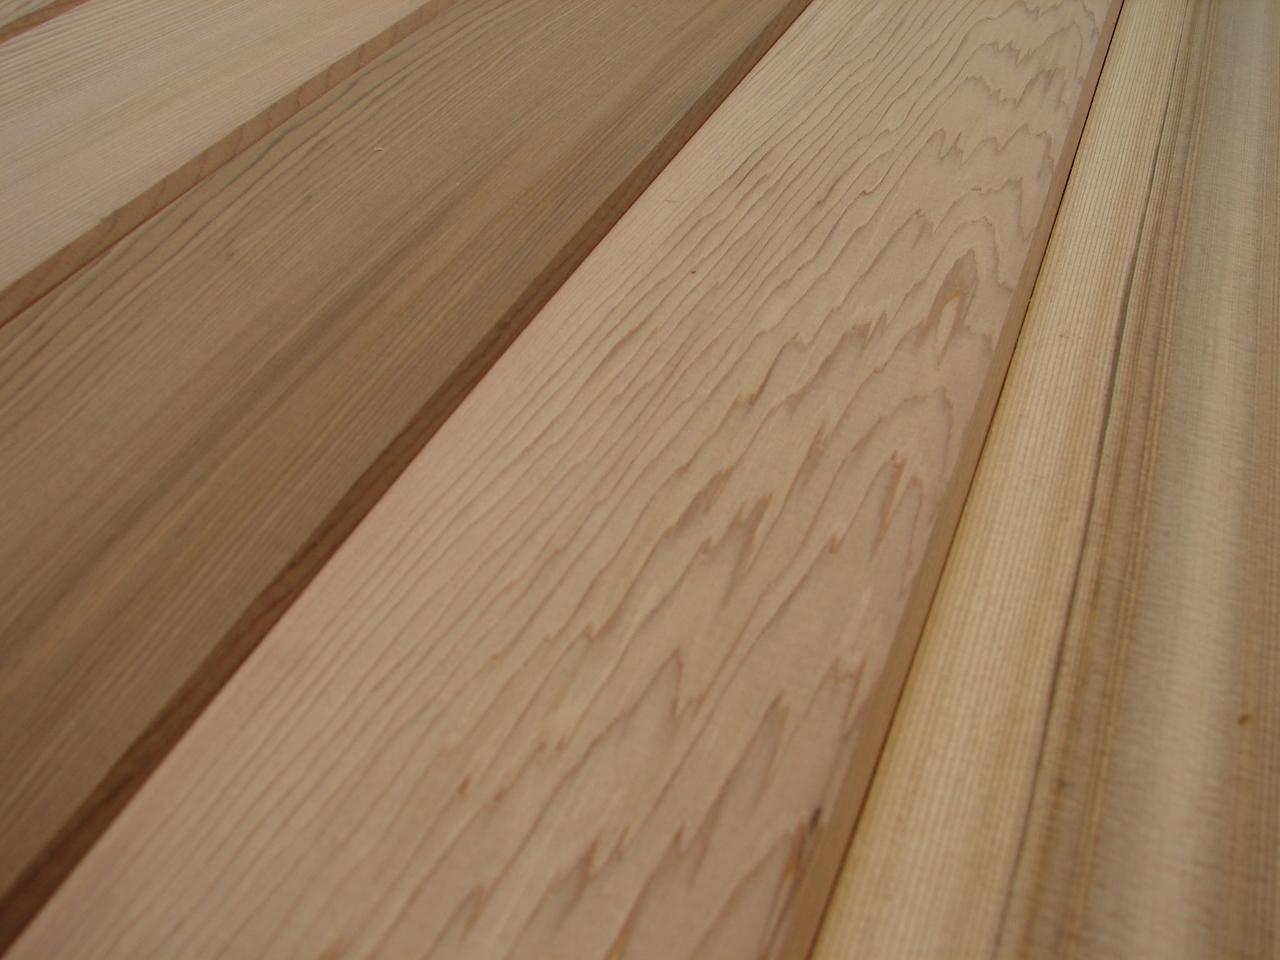 10x western red cedar profilbretter 580x84x18mm - holz-&stahlhandel